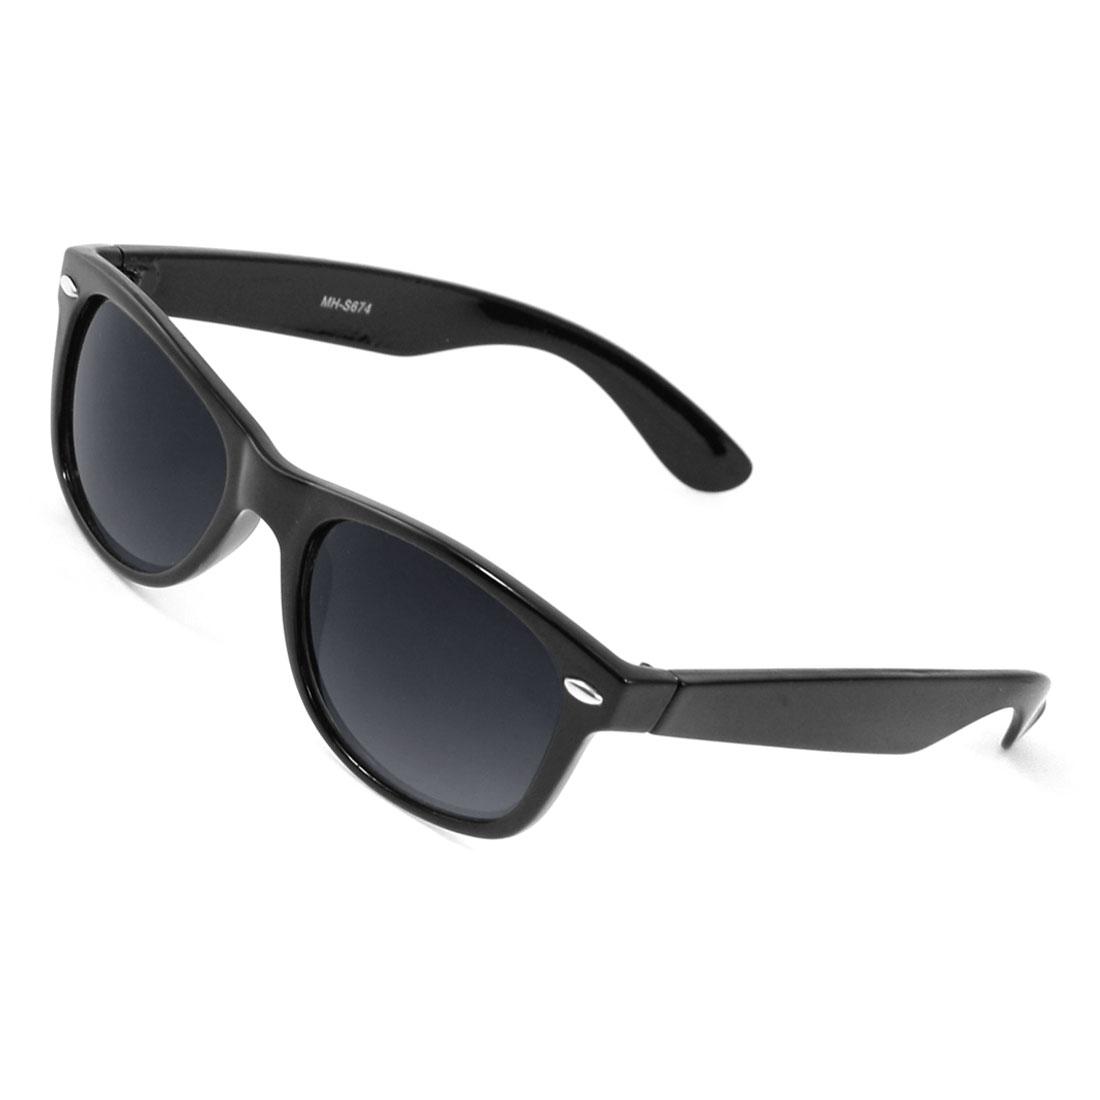 Lady Square Shaped Lens Full Rim Black Plastic Eyewear Sunglasses